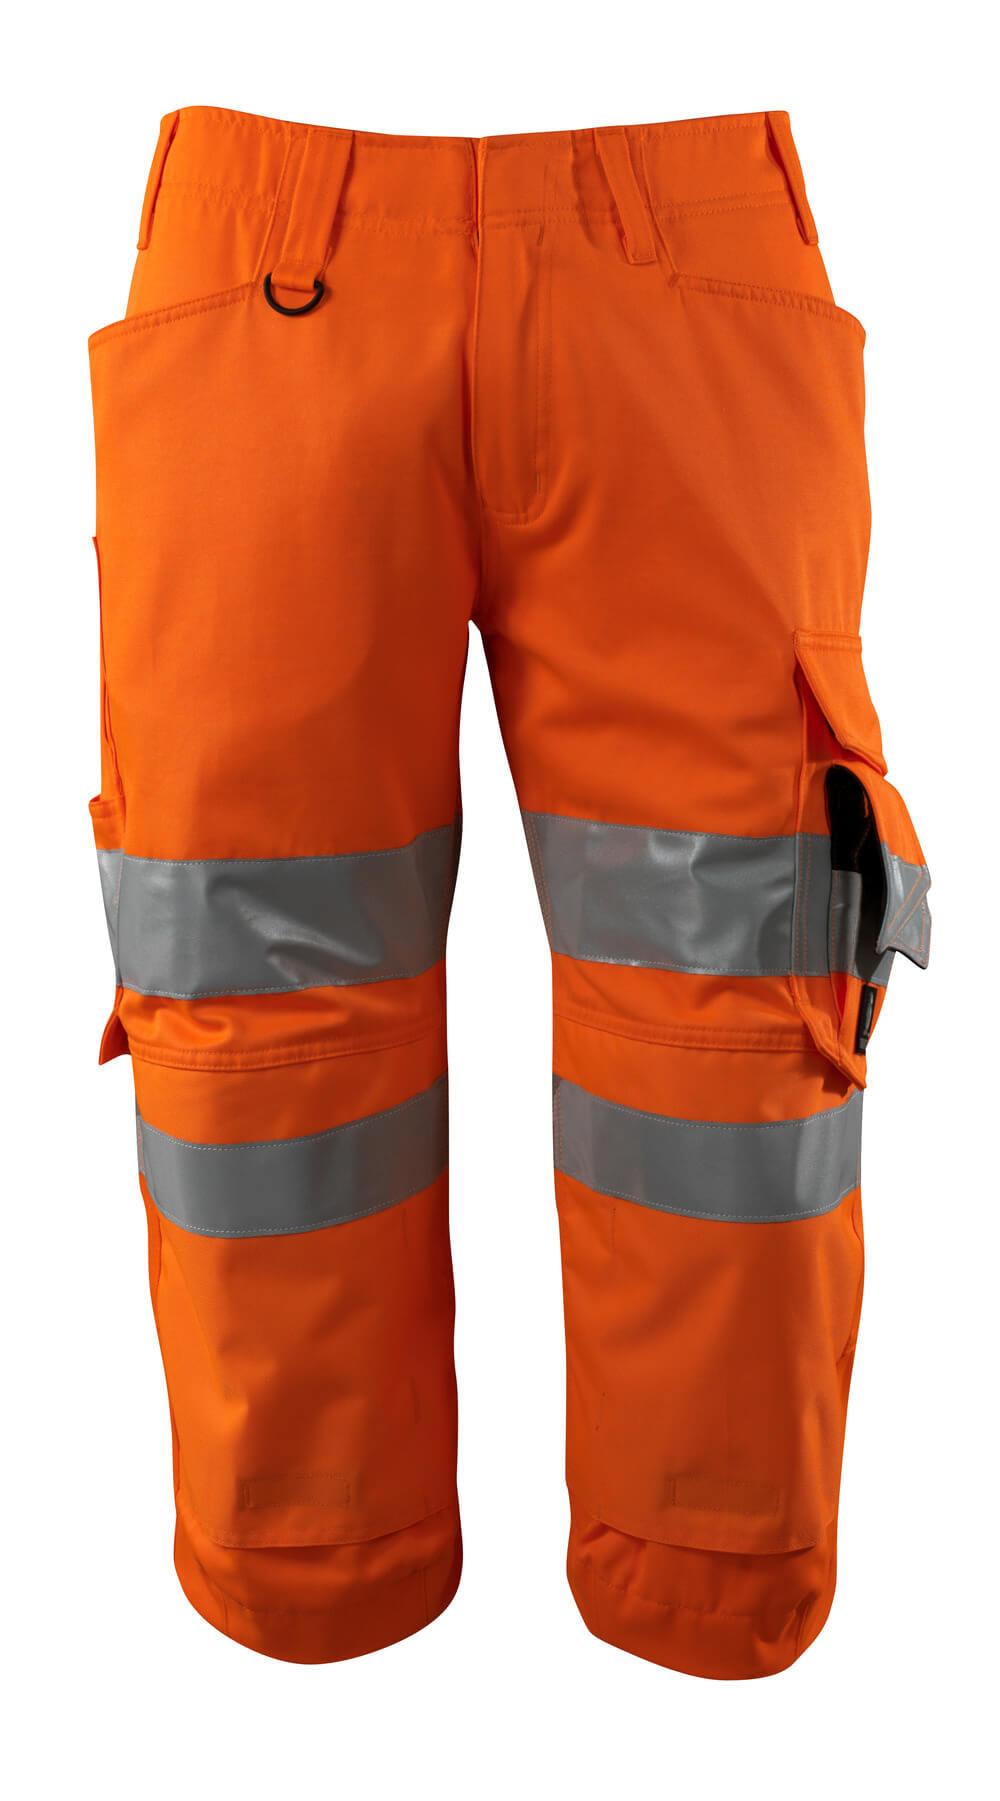 ¾ Length Trousers, kneepad pockets, cl 2